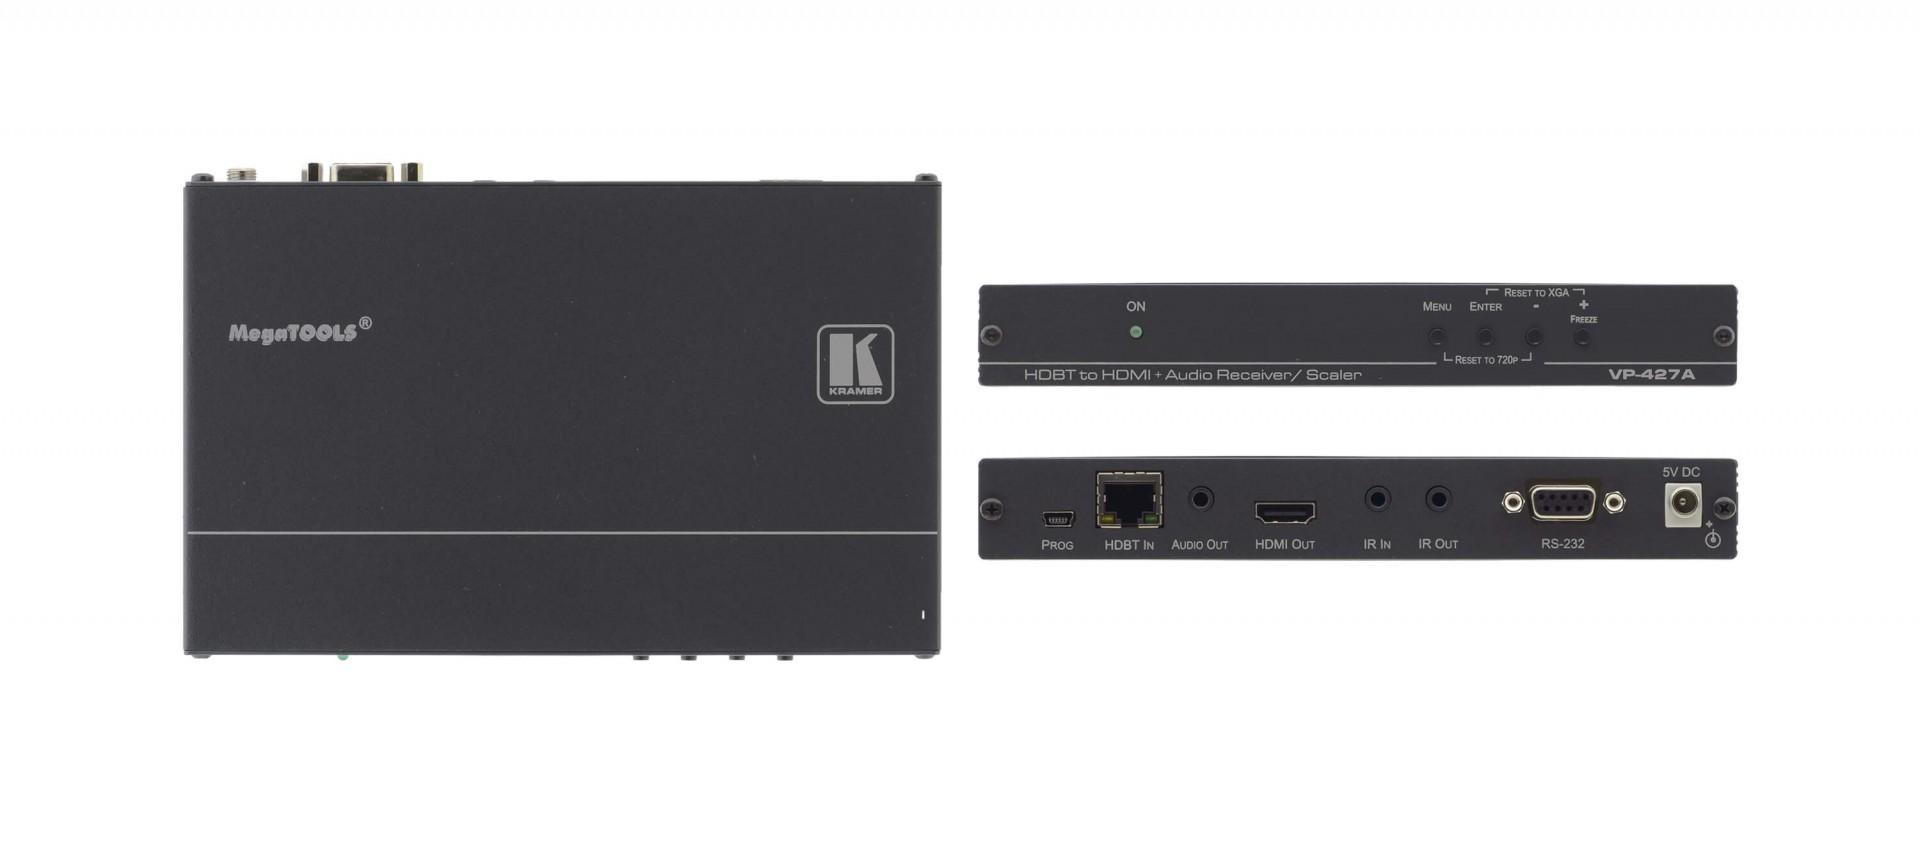 Kramer VP-427A HDBaseT to HDMI & Audio ProScale™ Receiver/Scaler